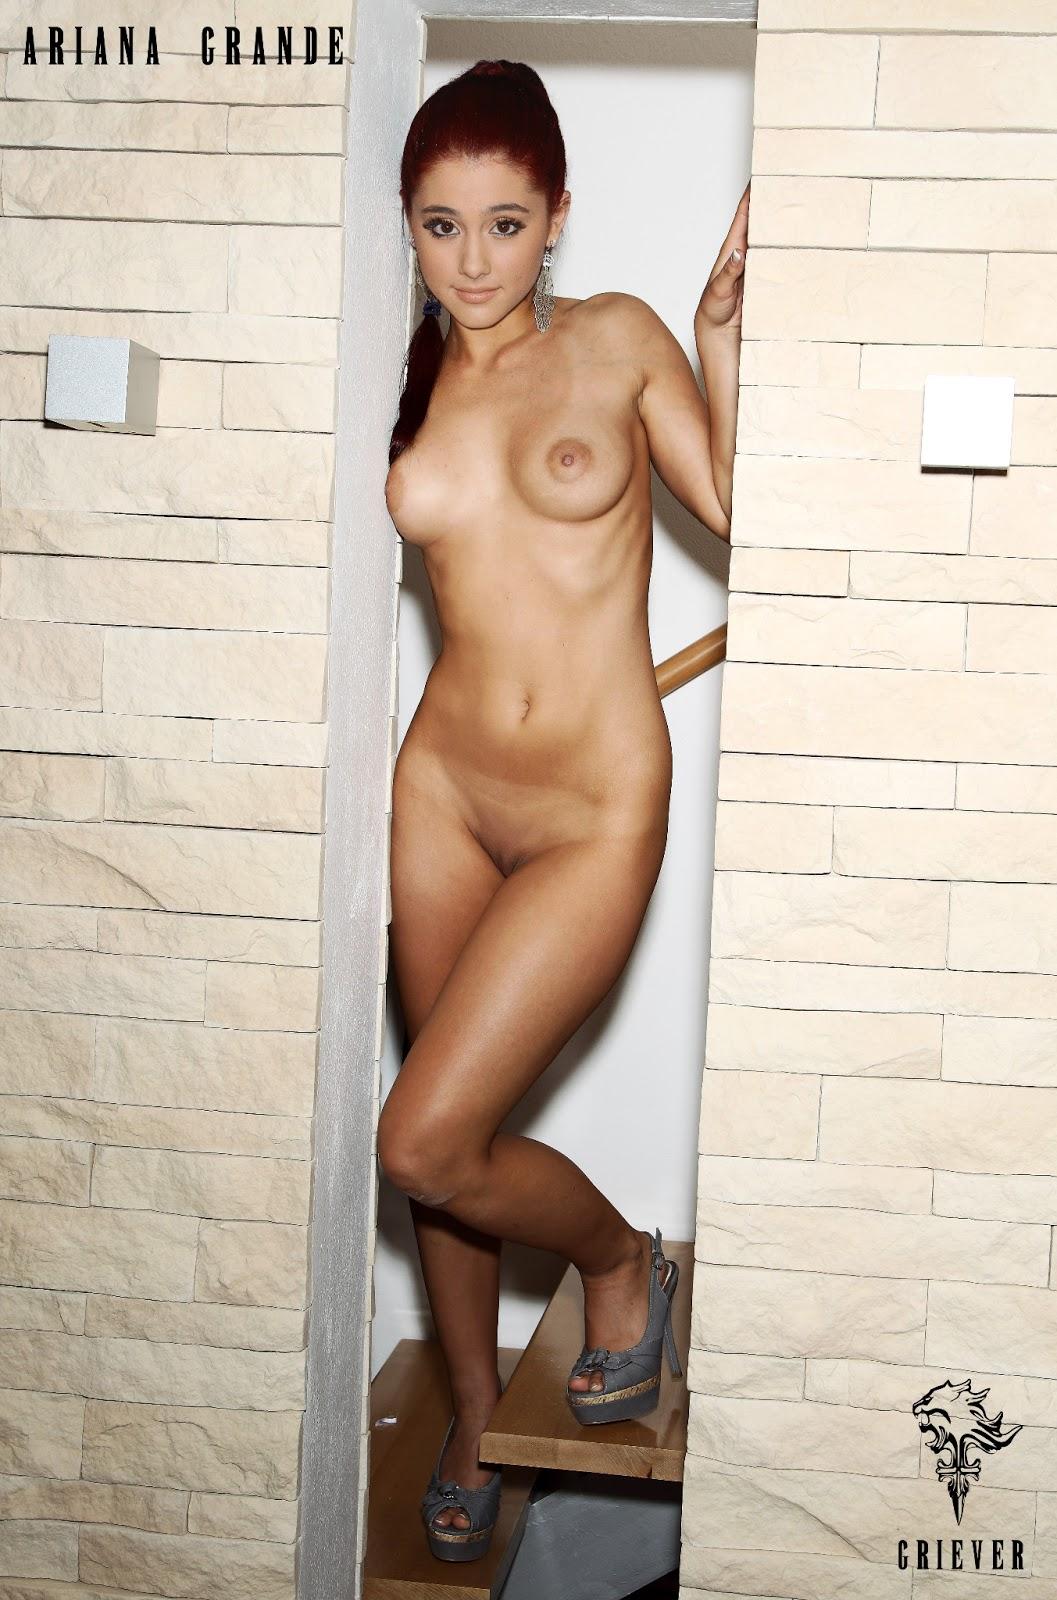 Ariana Grande Nude Photos